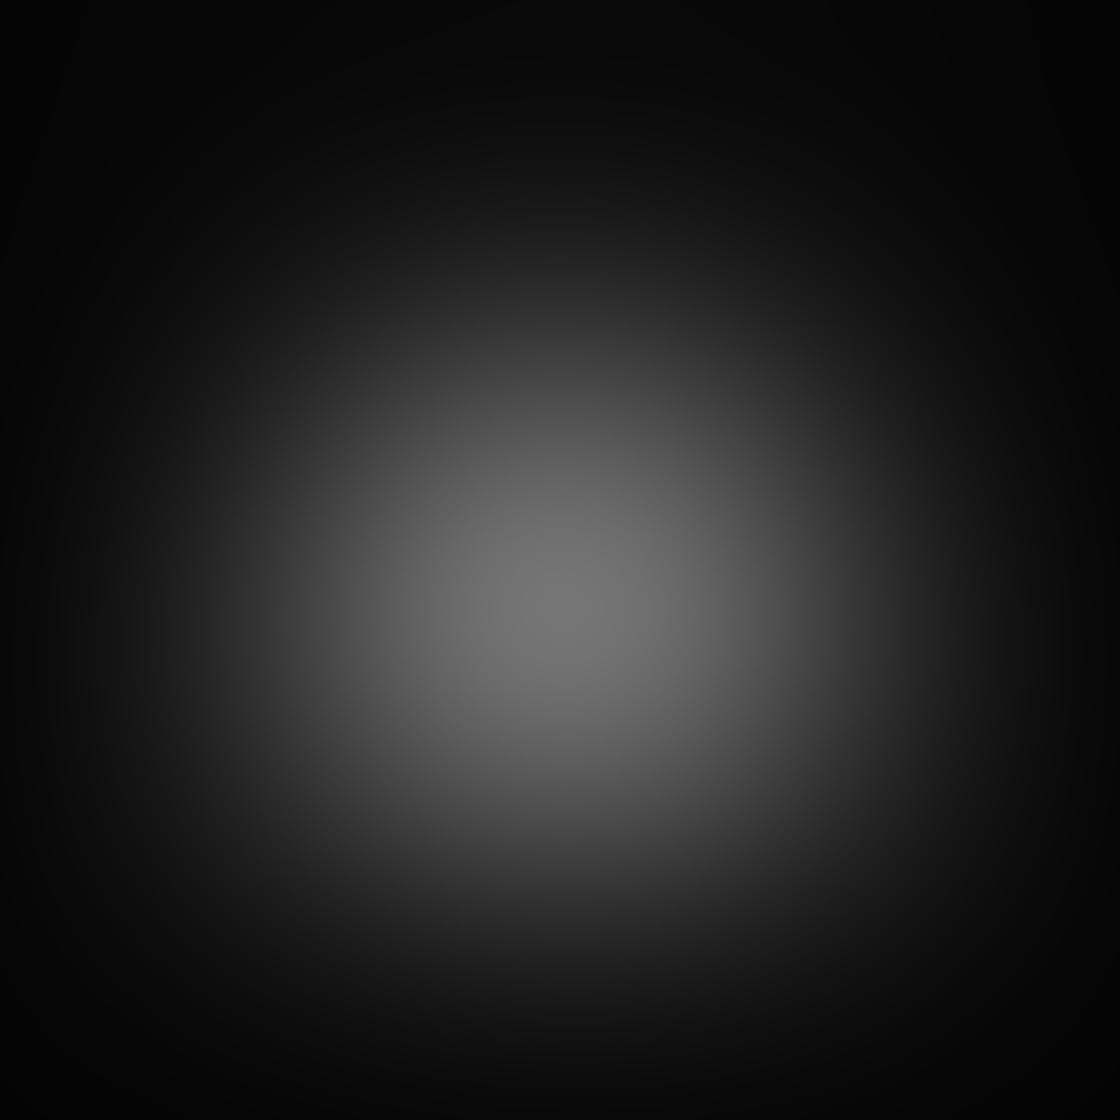 iPhone Photo Black White 5